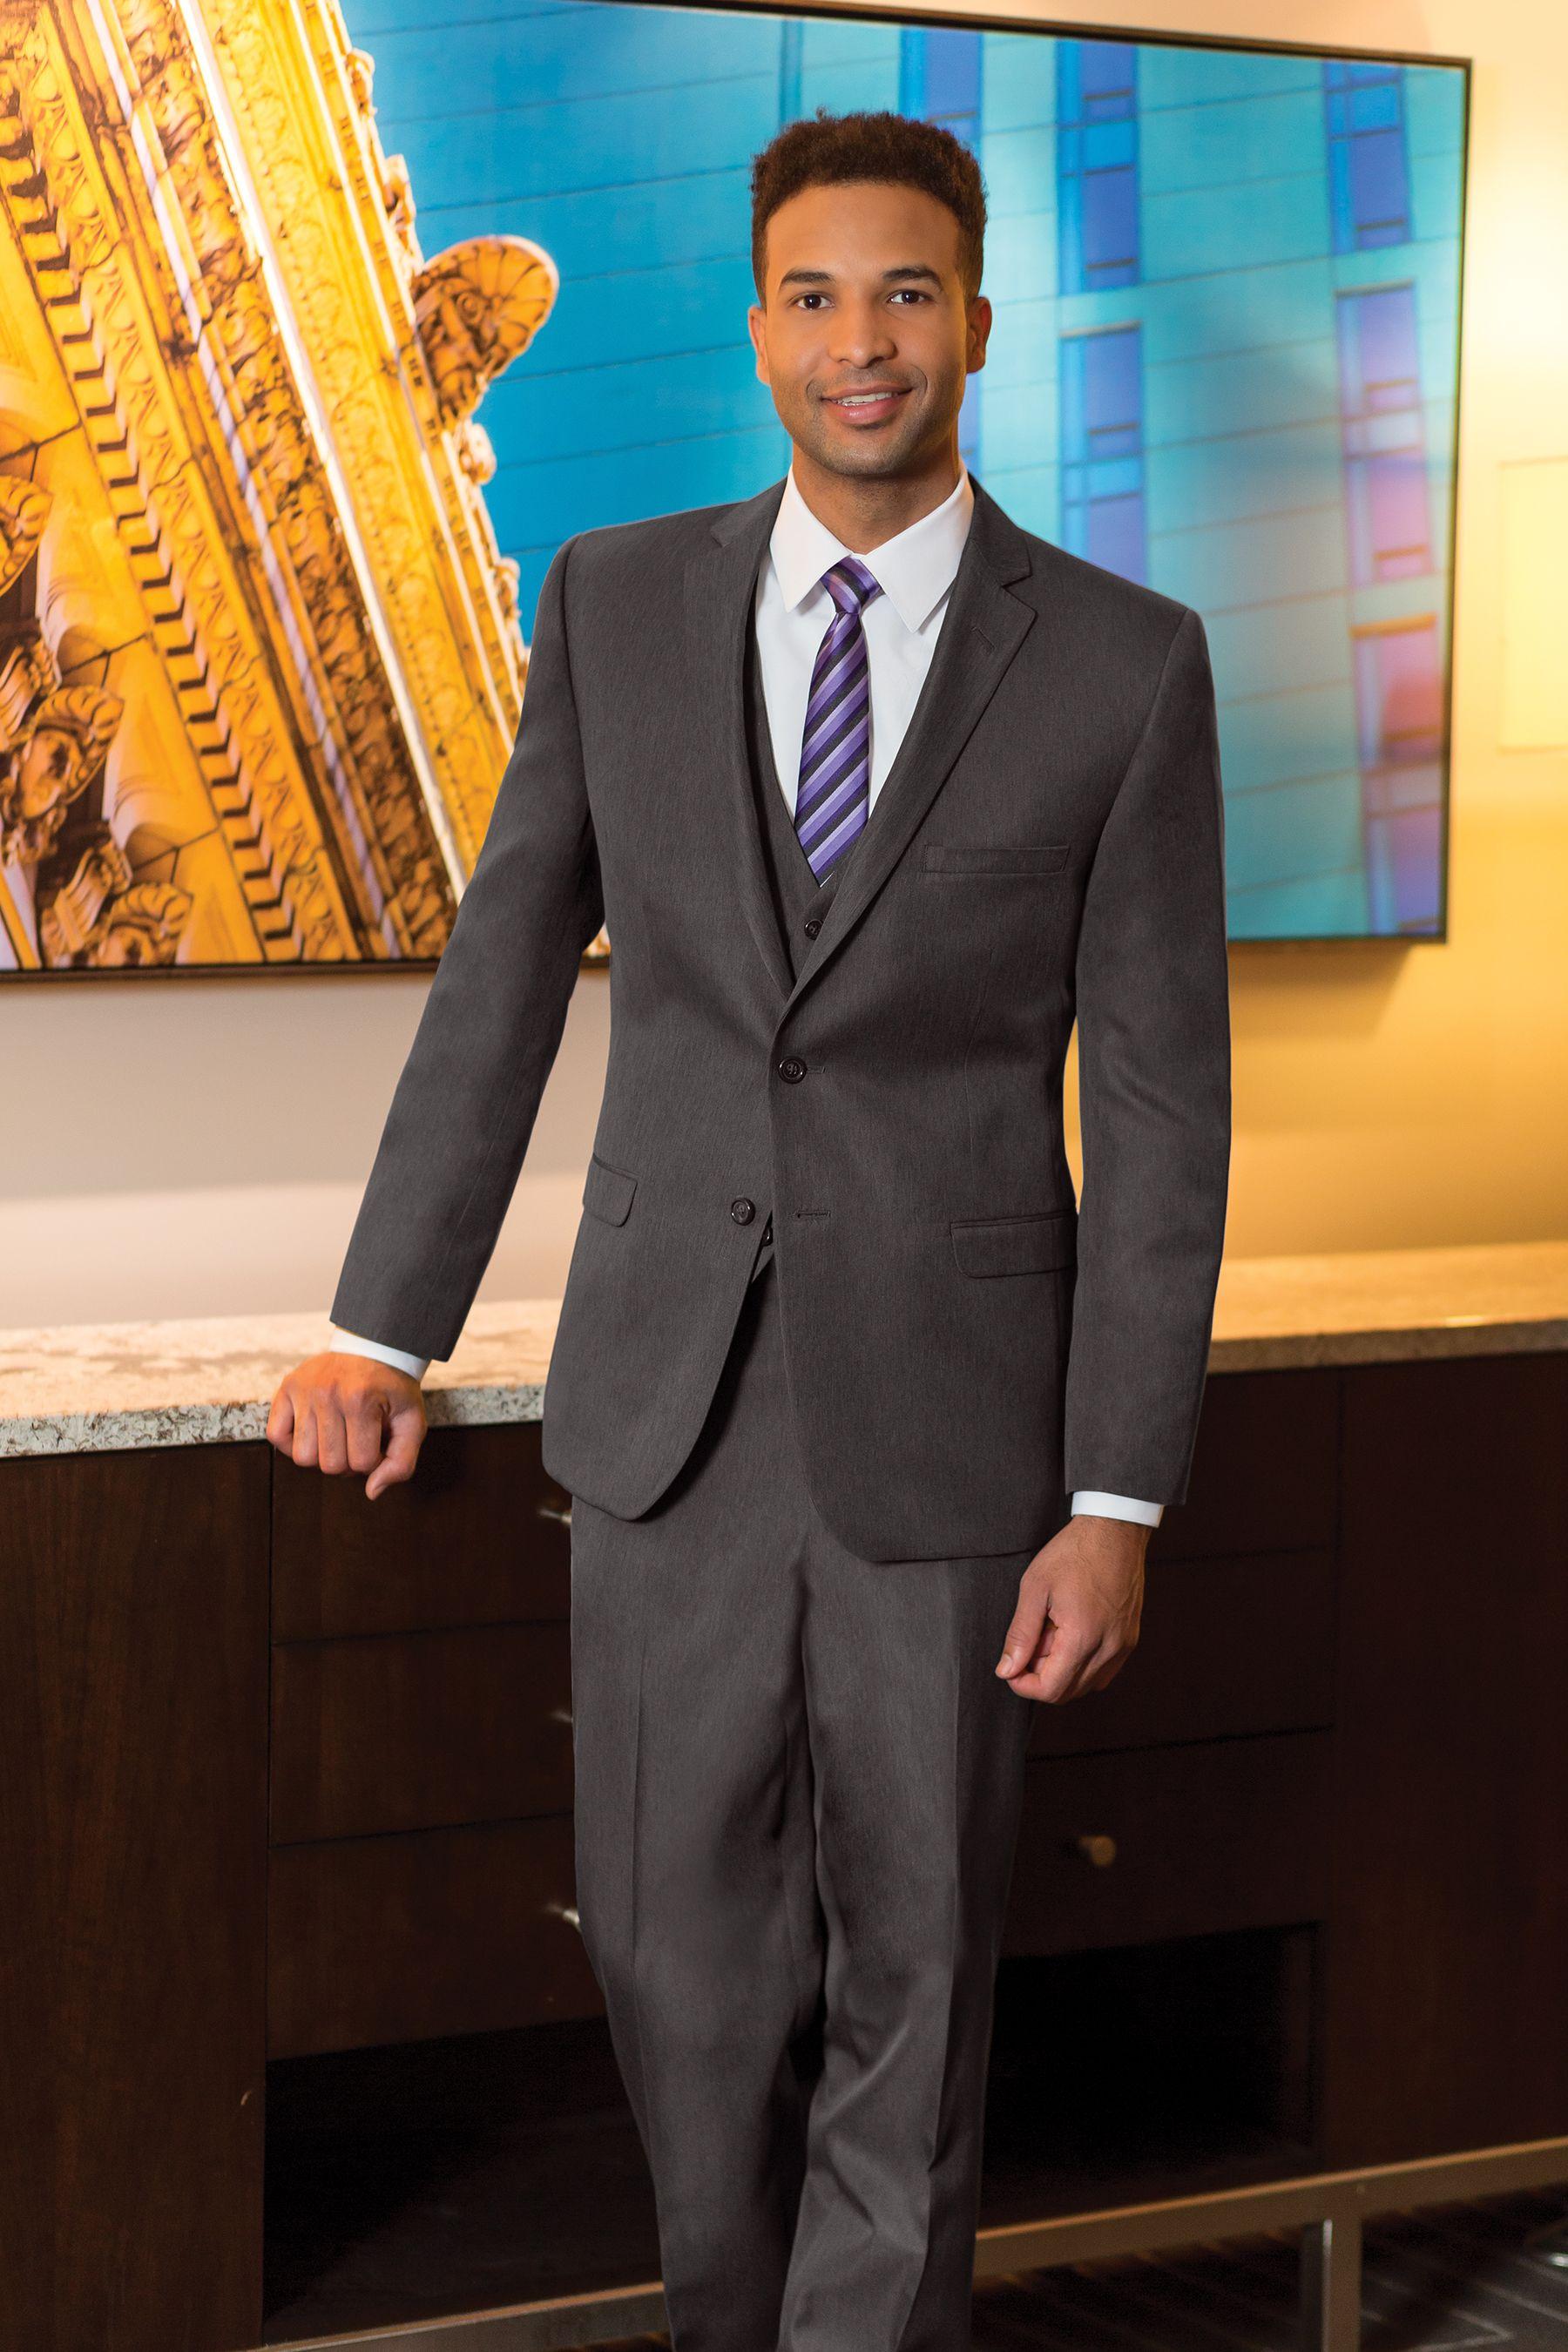 7adb0eb2ce0 slim fit dark grey suit for purchase